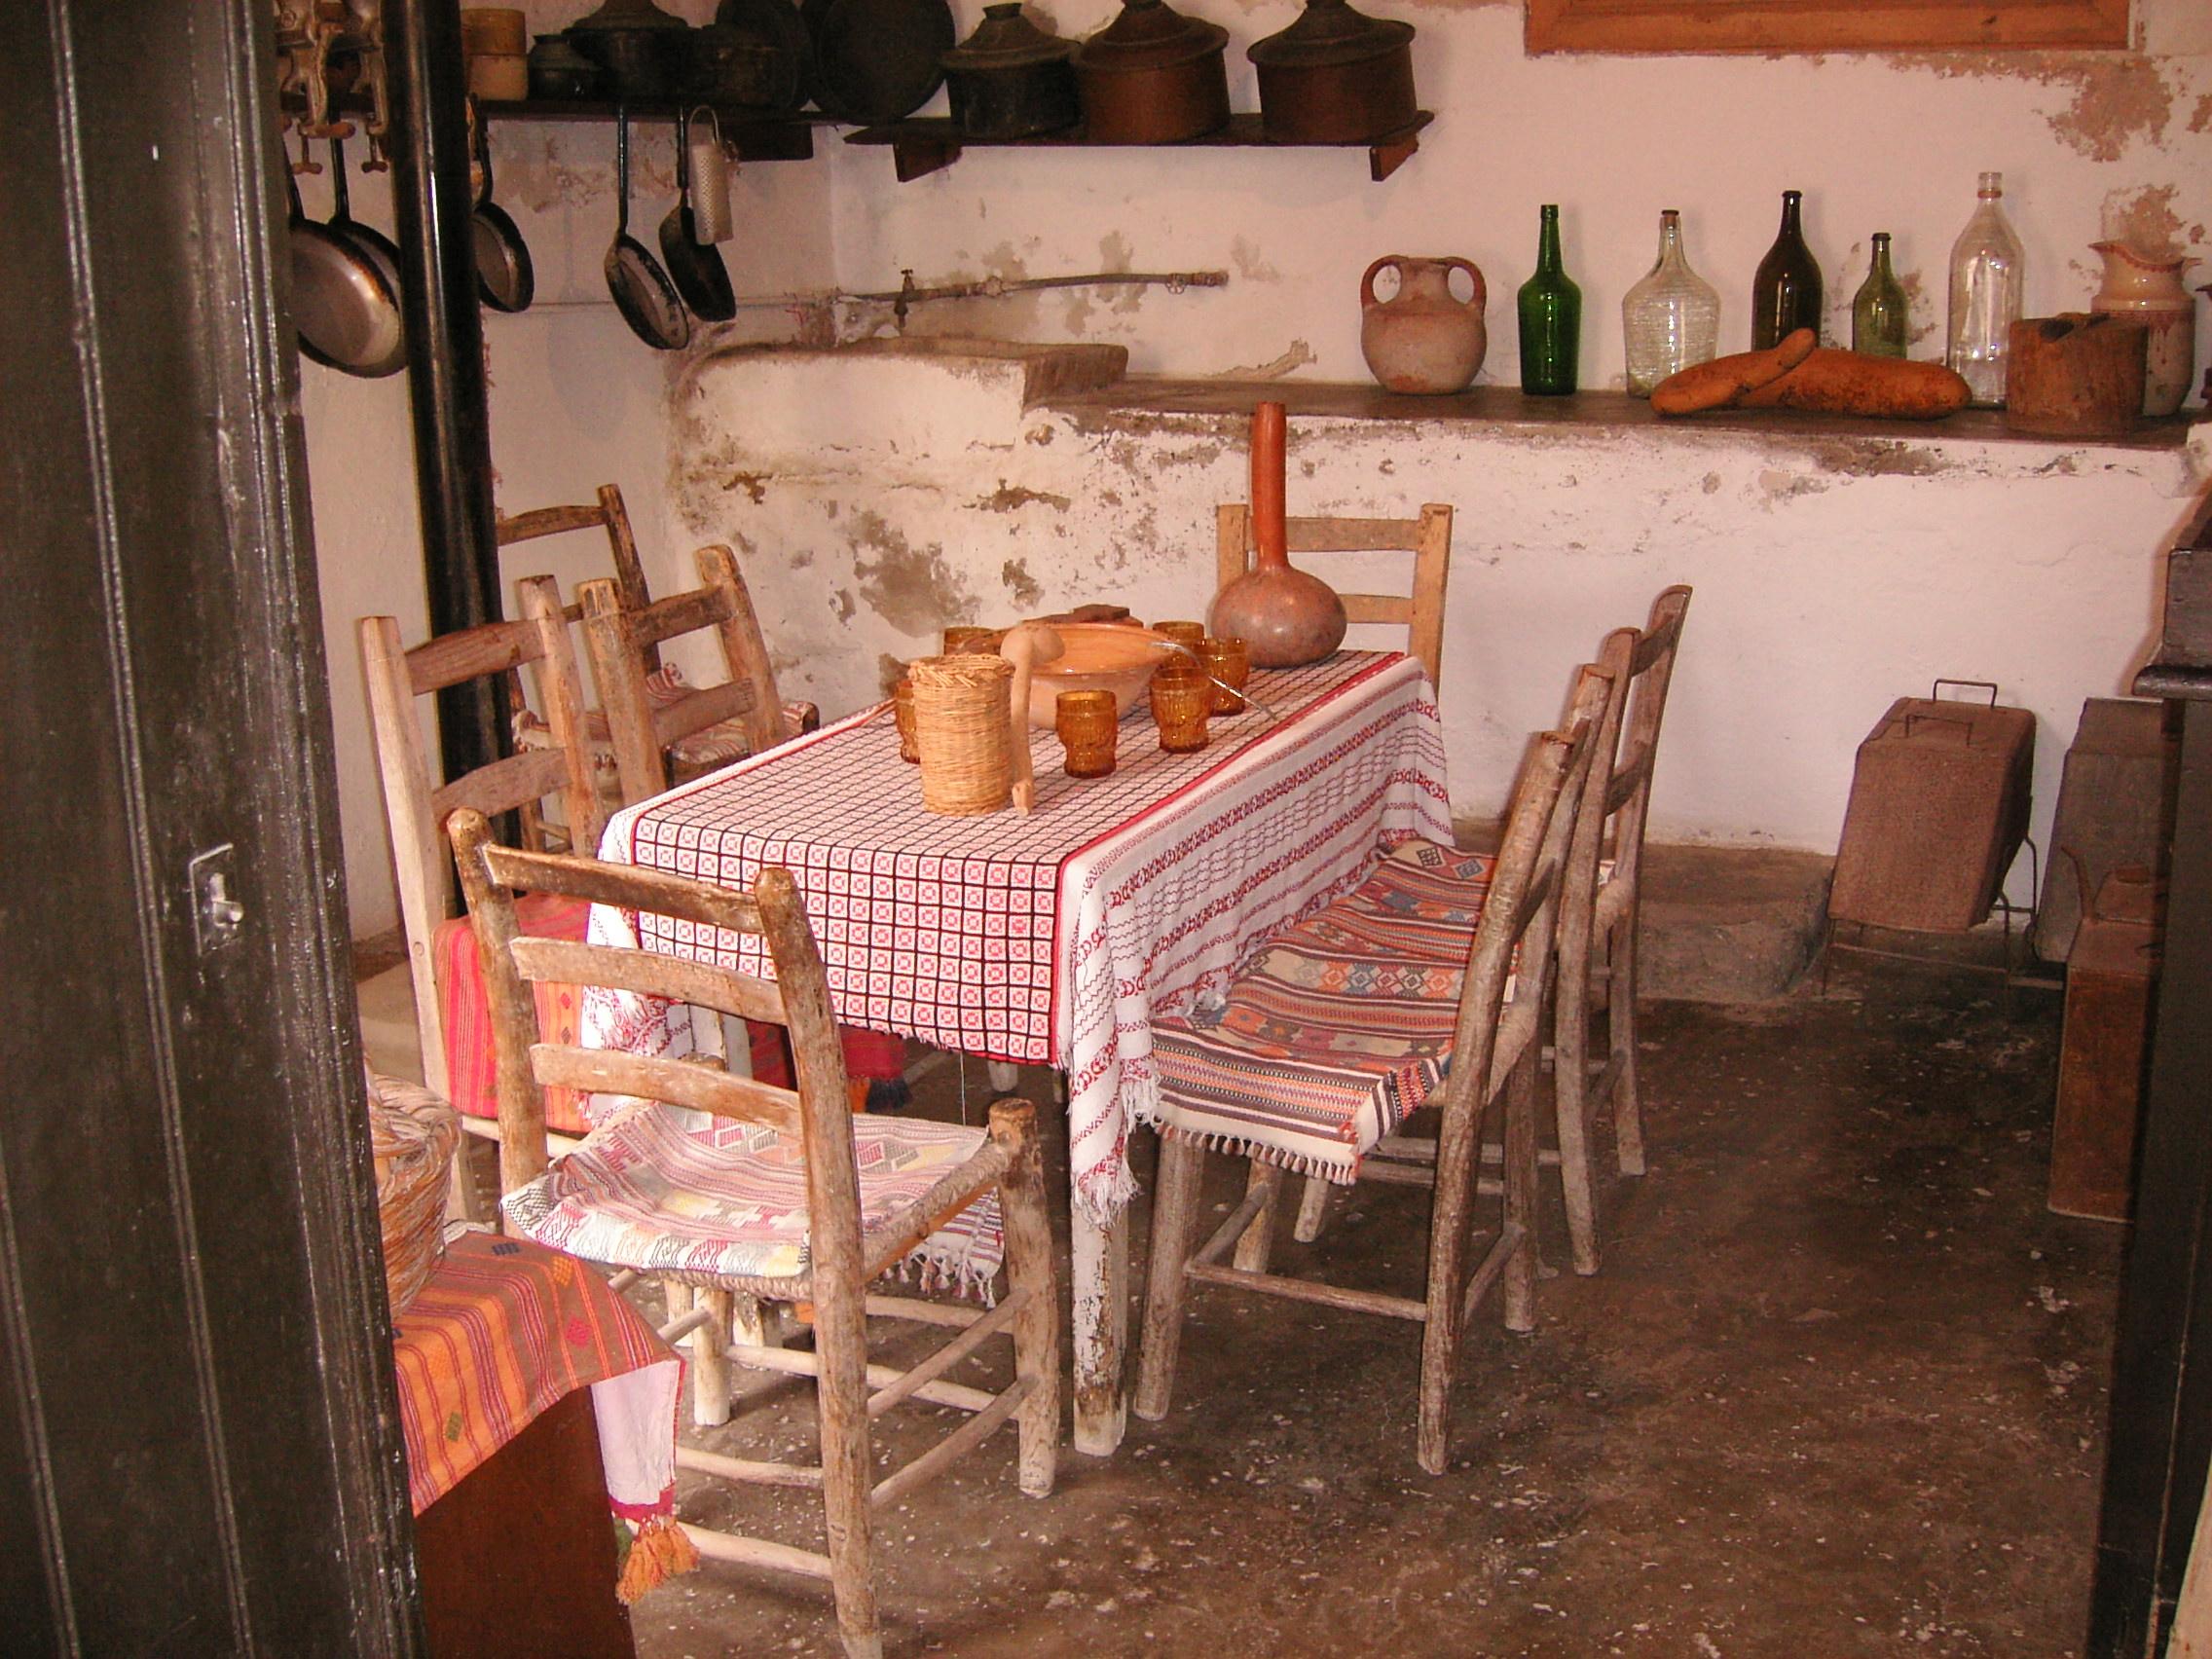 File:Bauernküche - panoramio.jpg - Wikimedia Commons